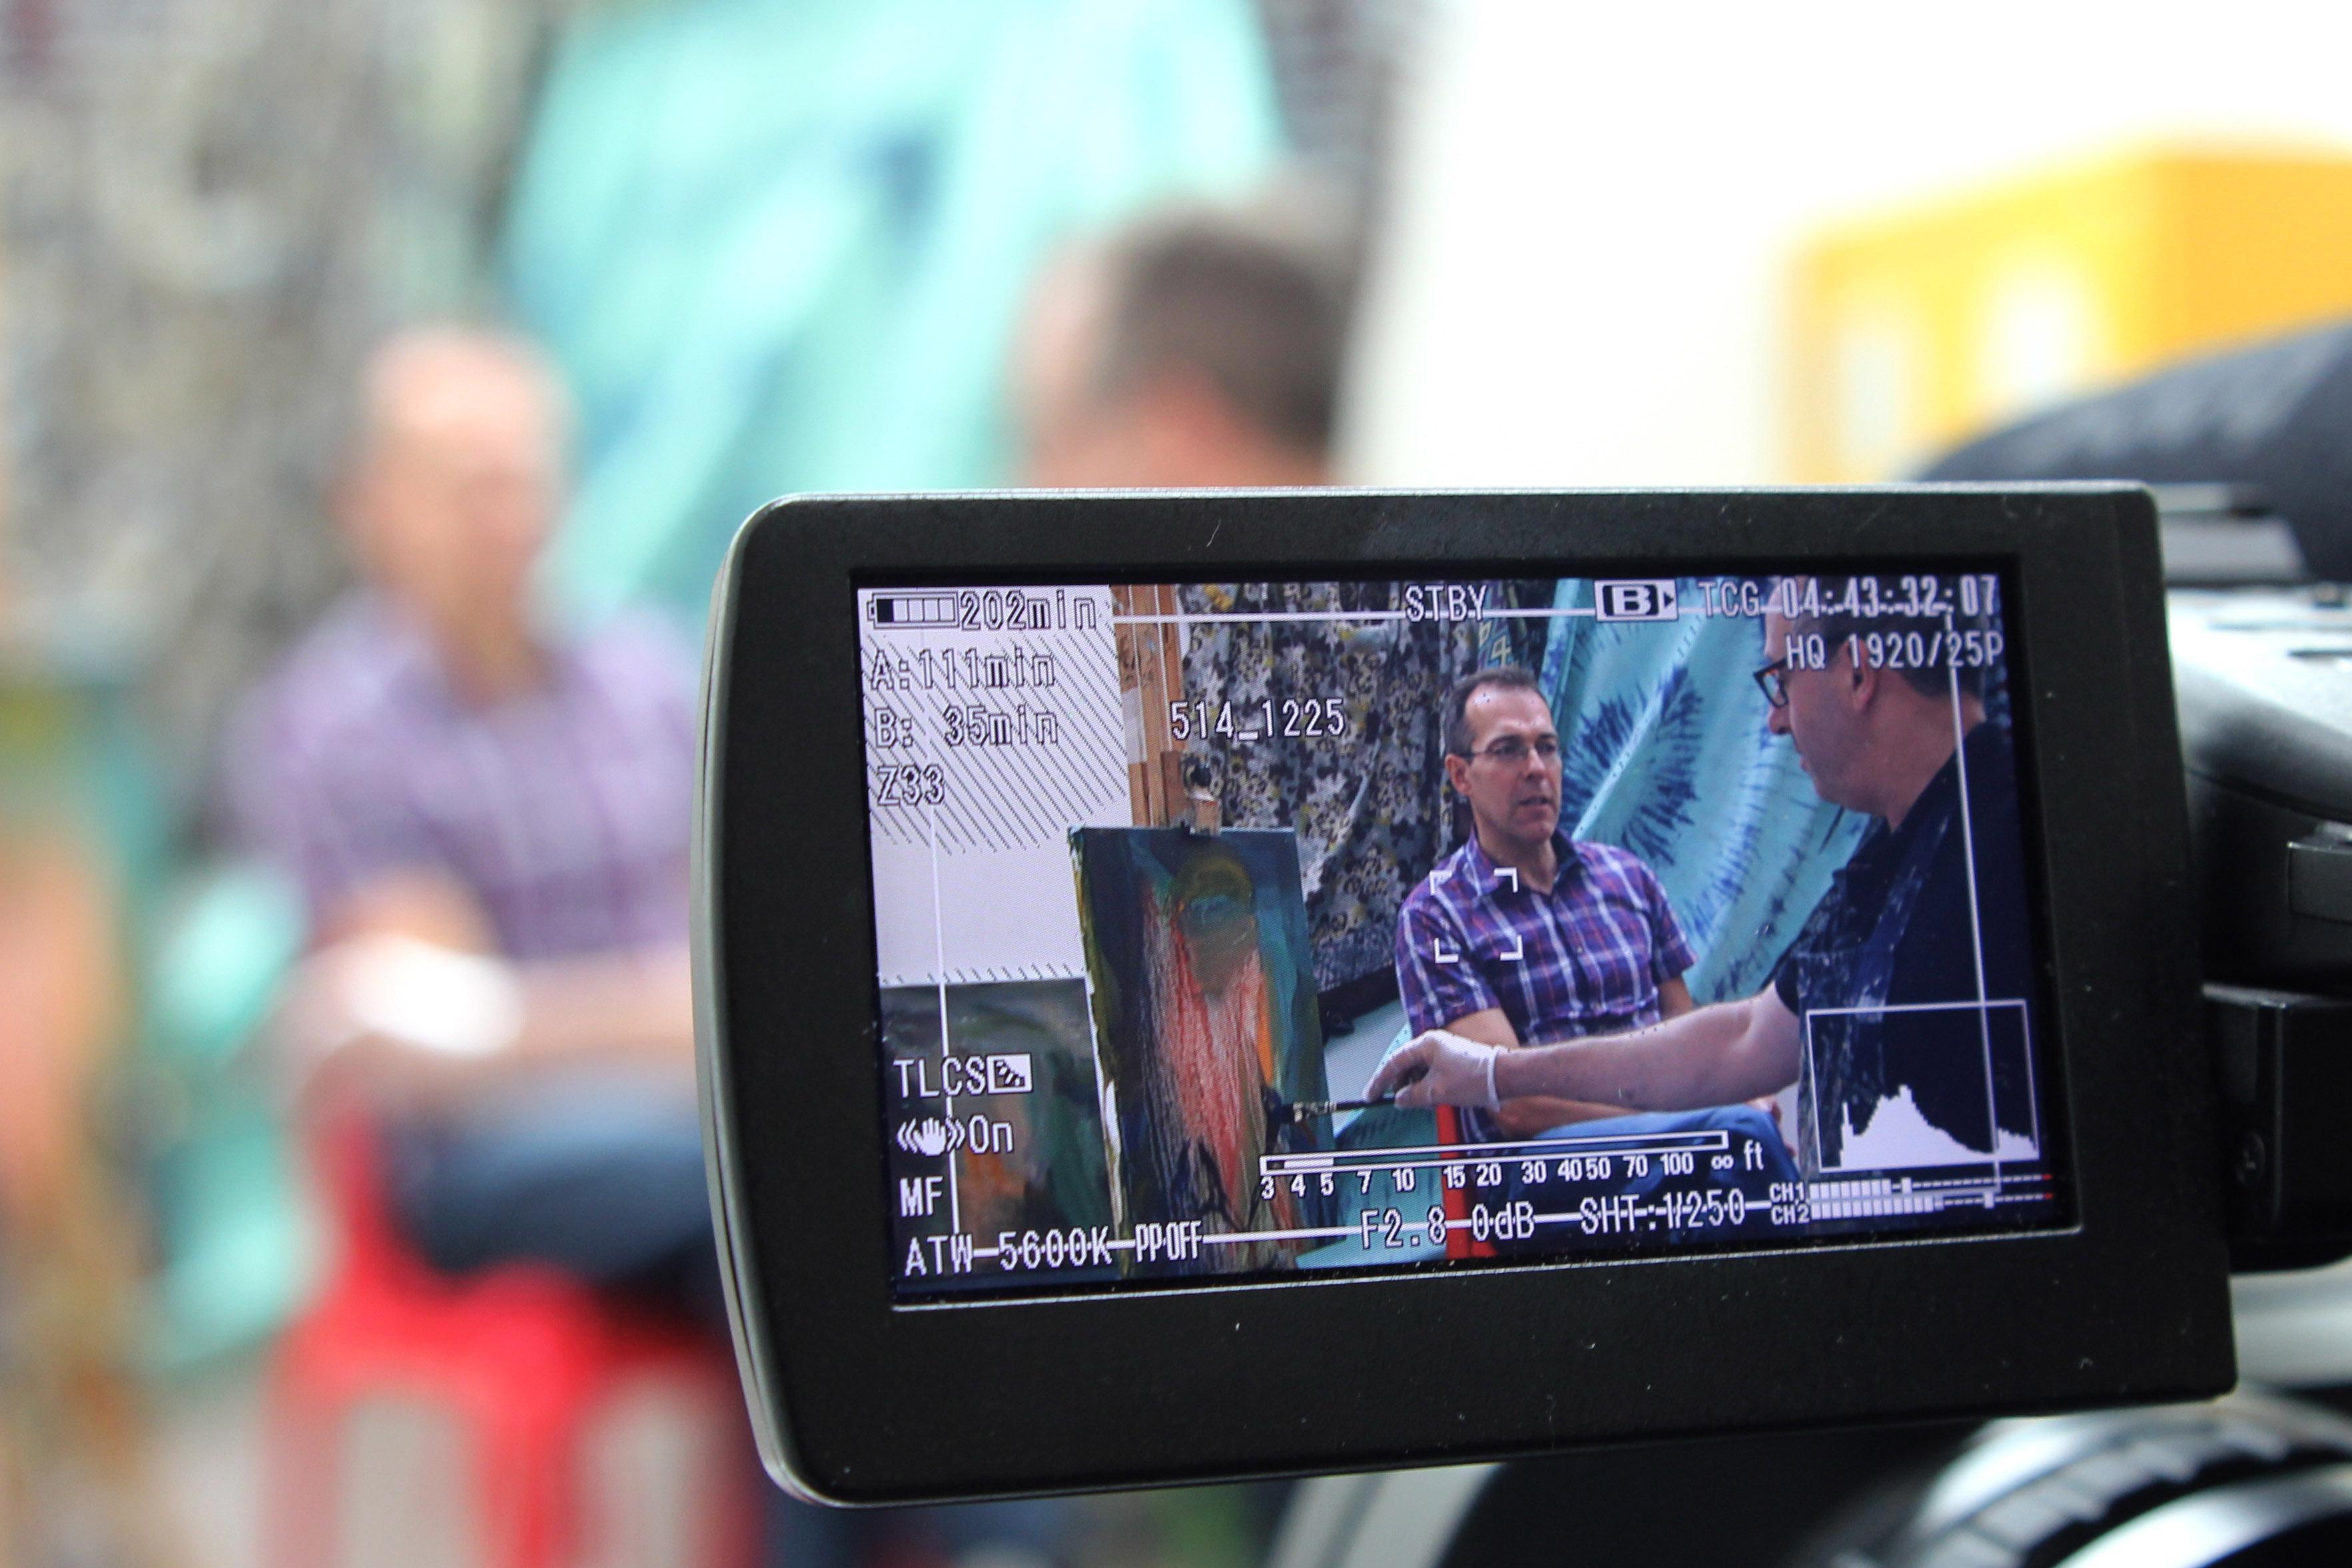 Nick Miller Pat Boran Oil on film July 2014